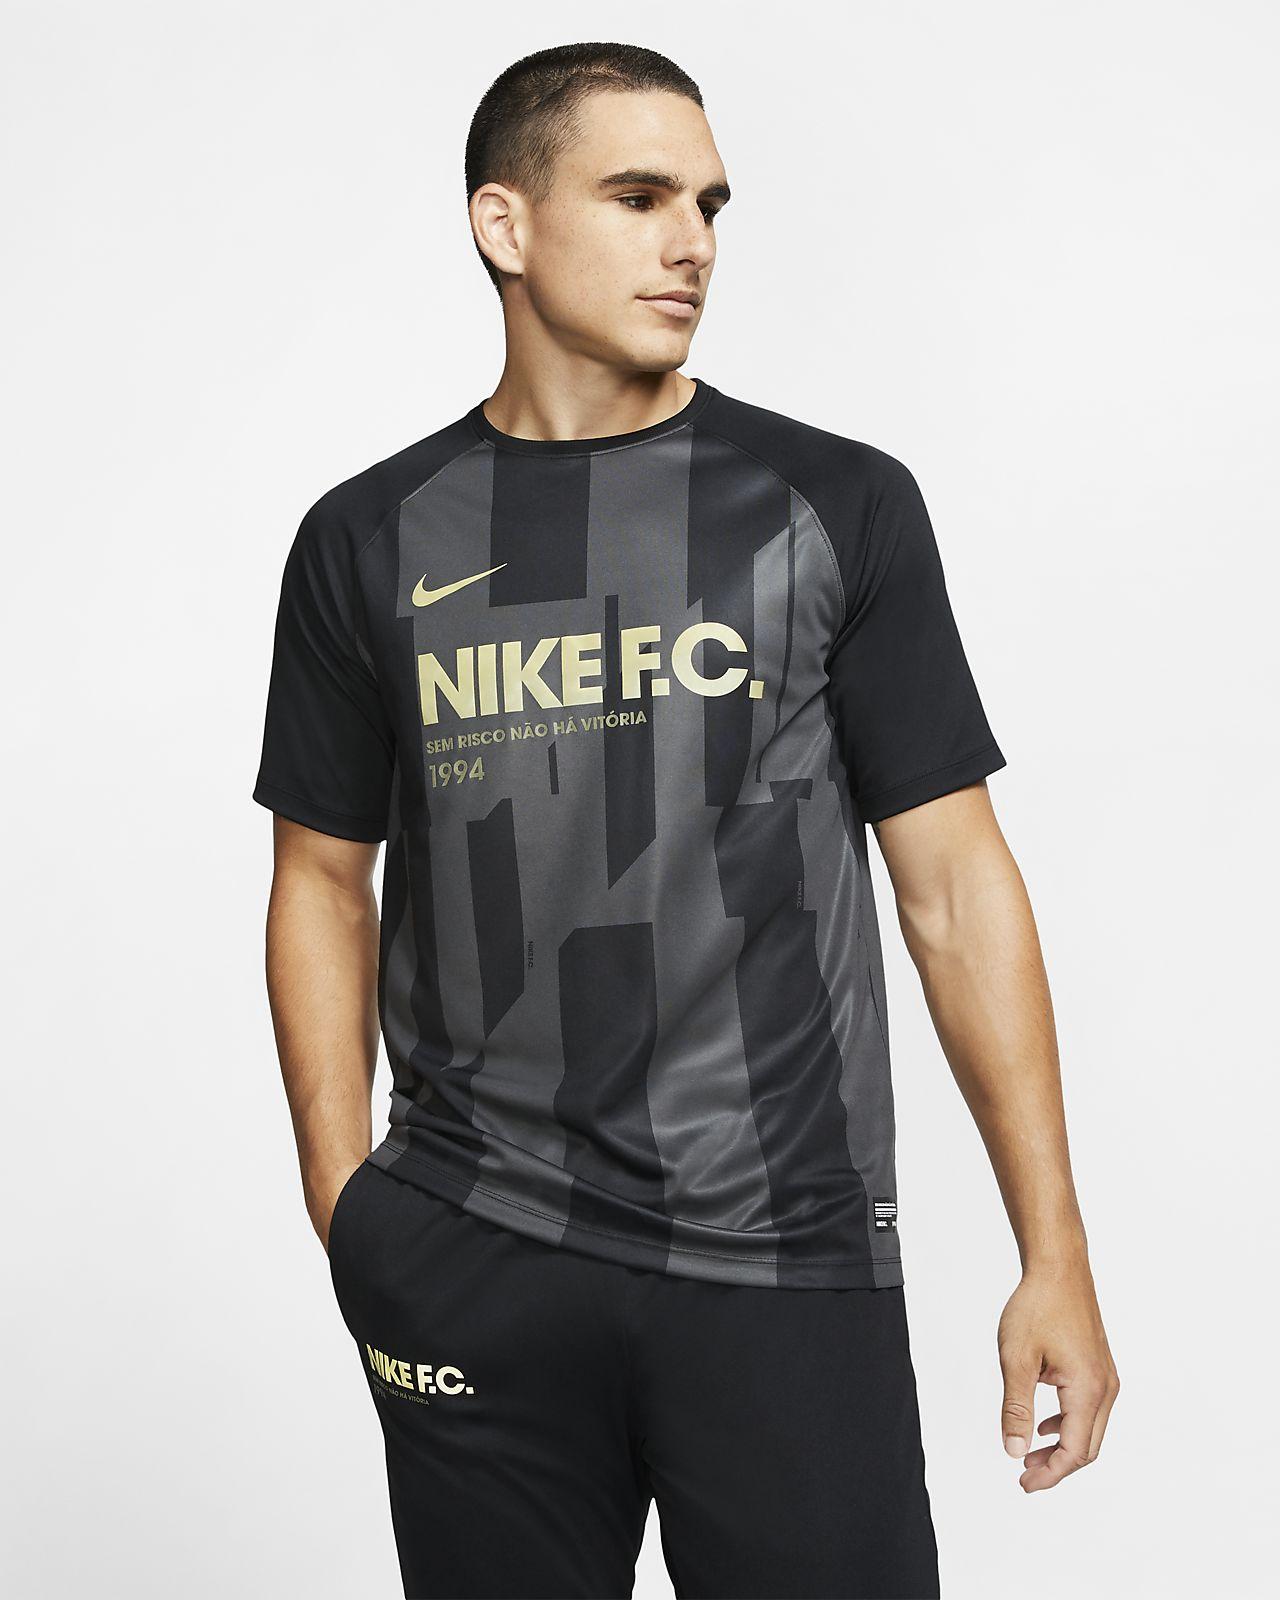 Nike F.C. Men's Short-Sleeve Shirt